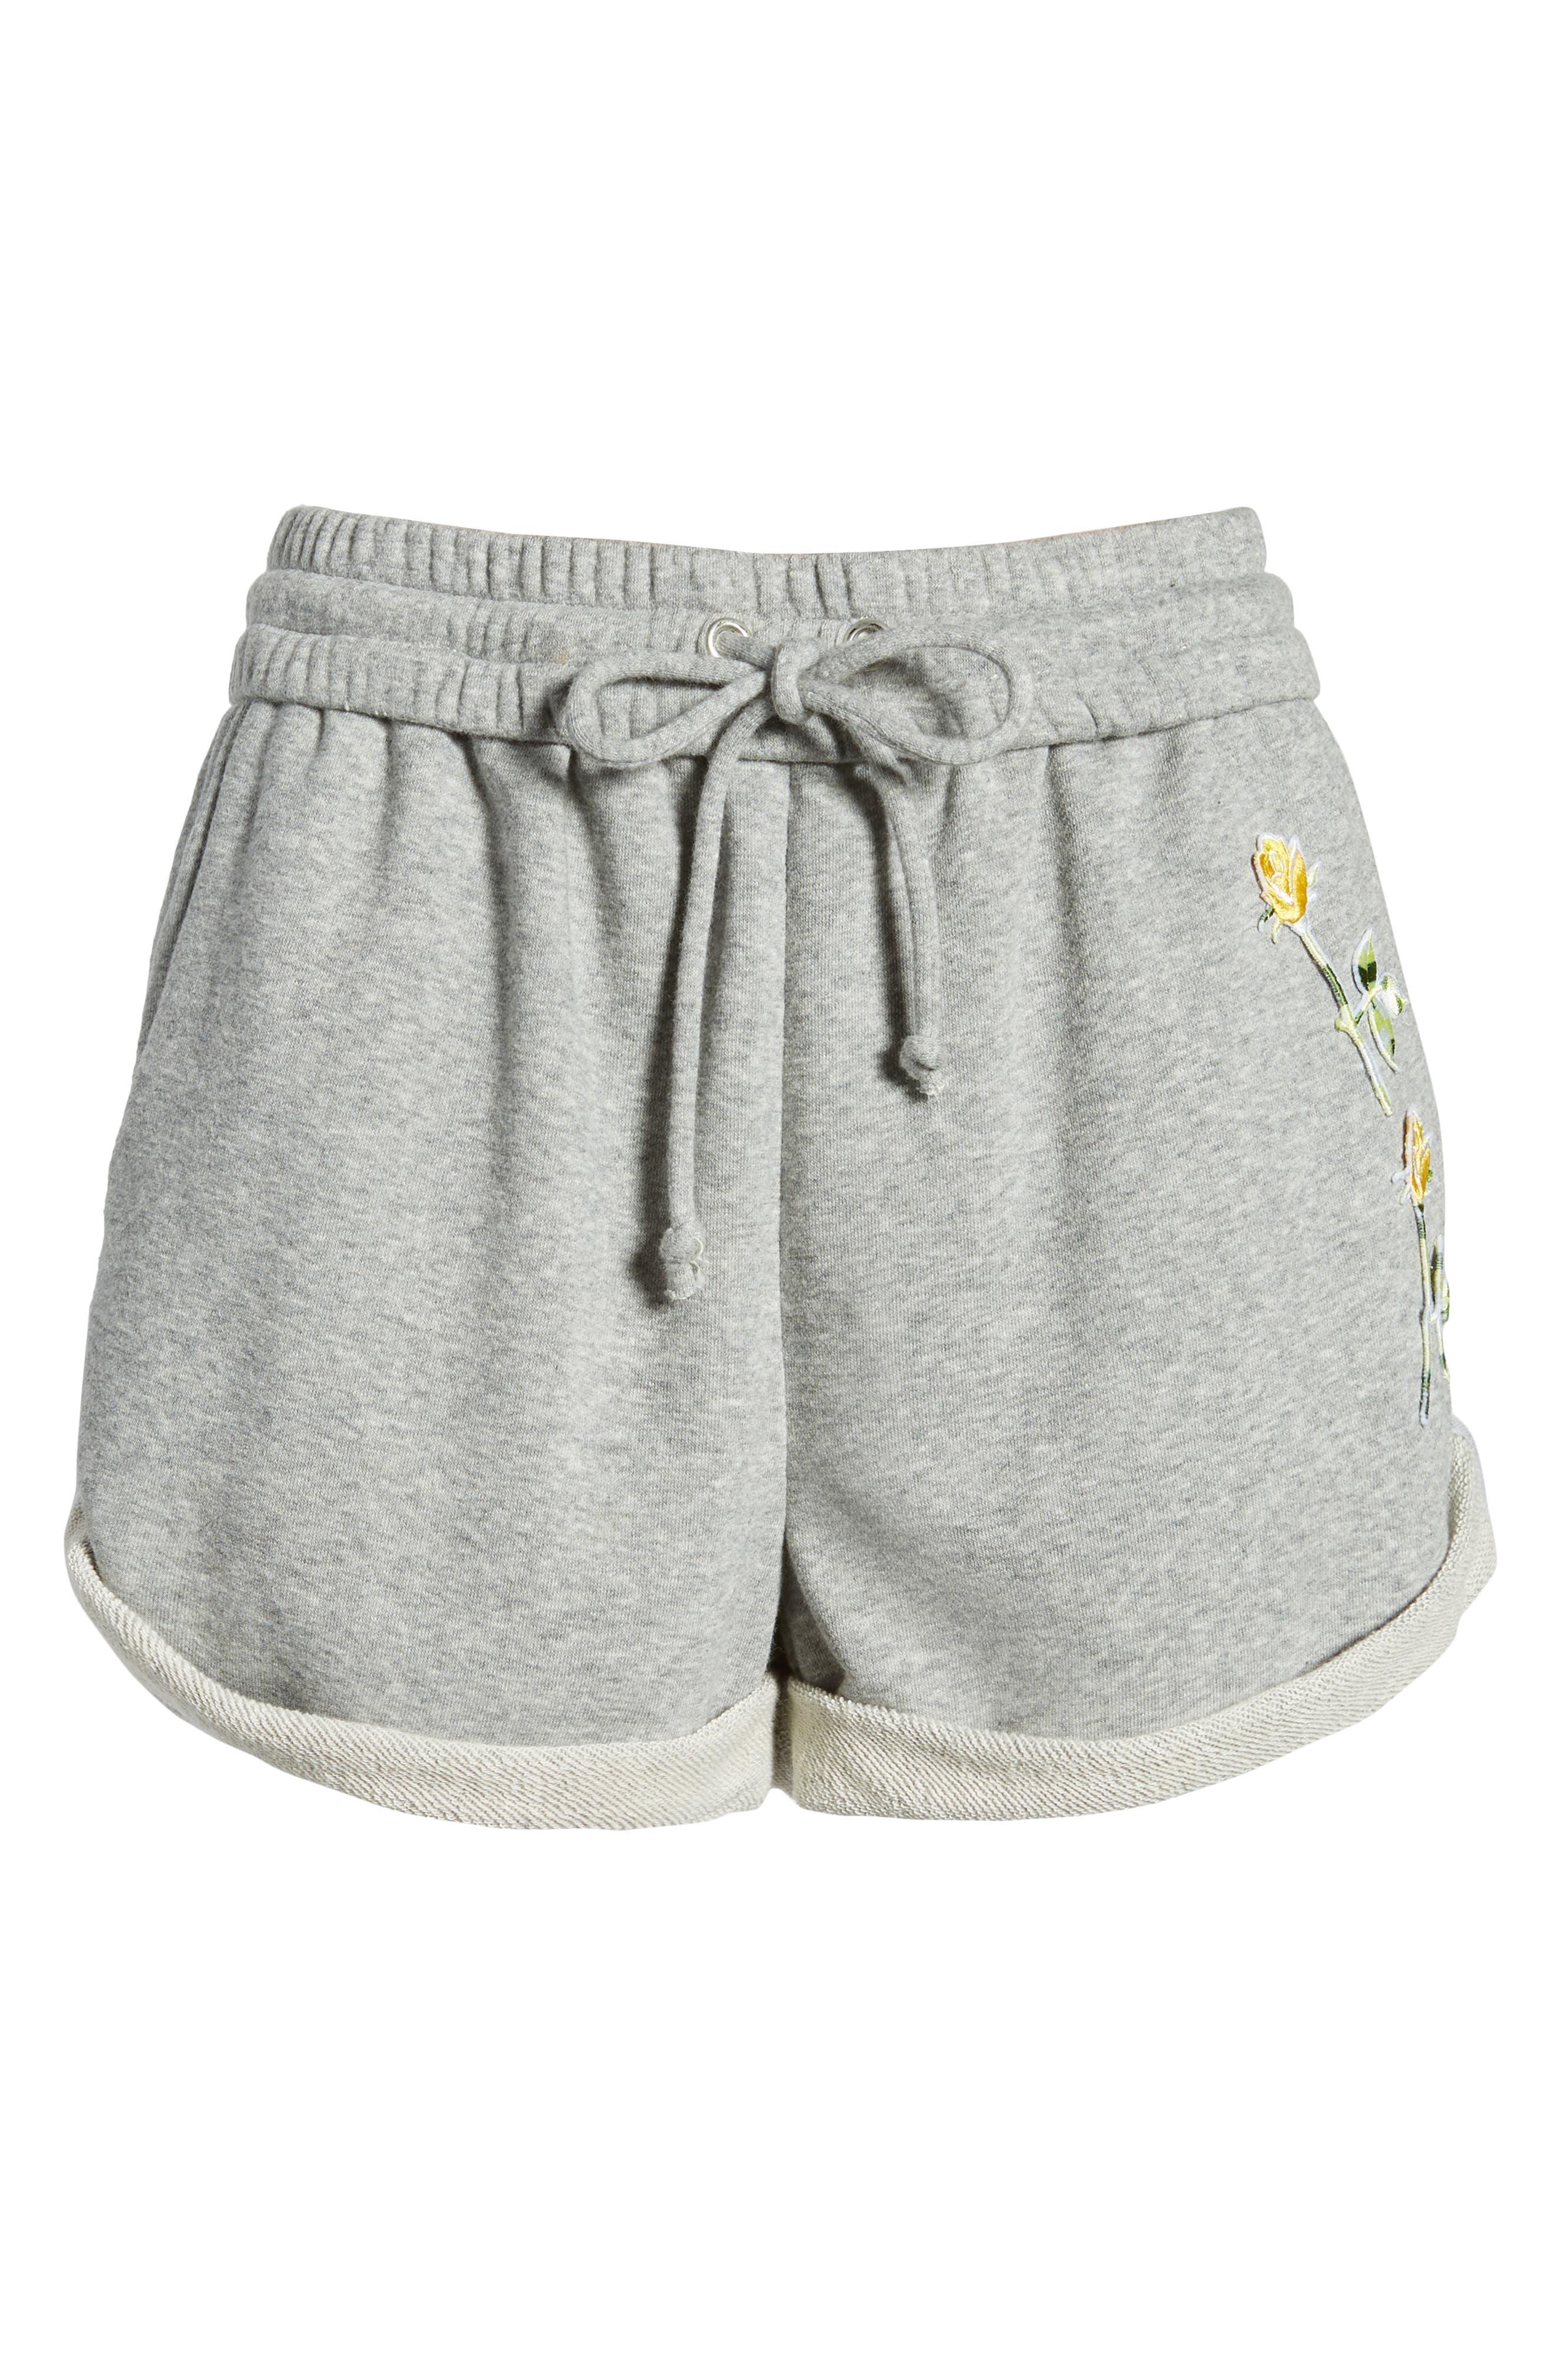 Rolled Drawstring Shorts,                             Alternate thumbnail 6, color,                             050